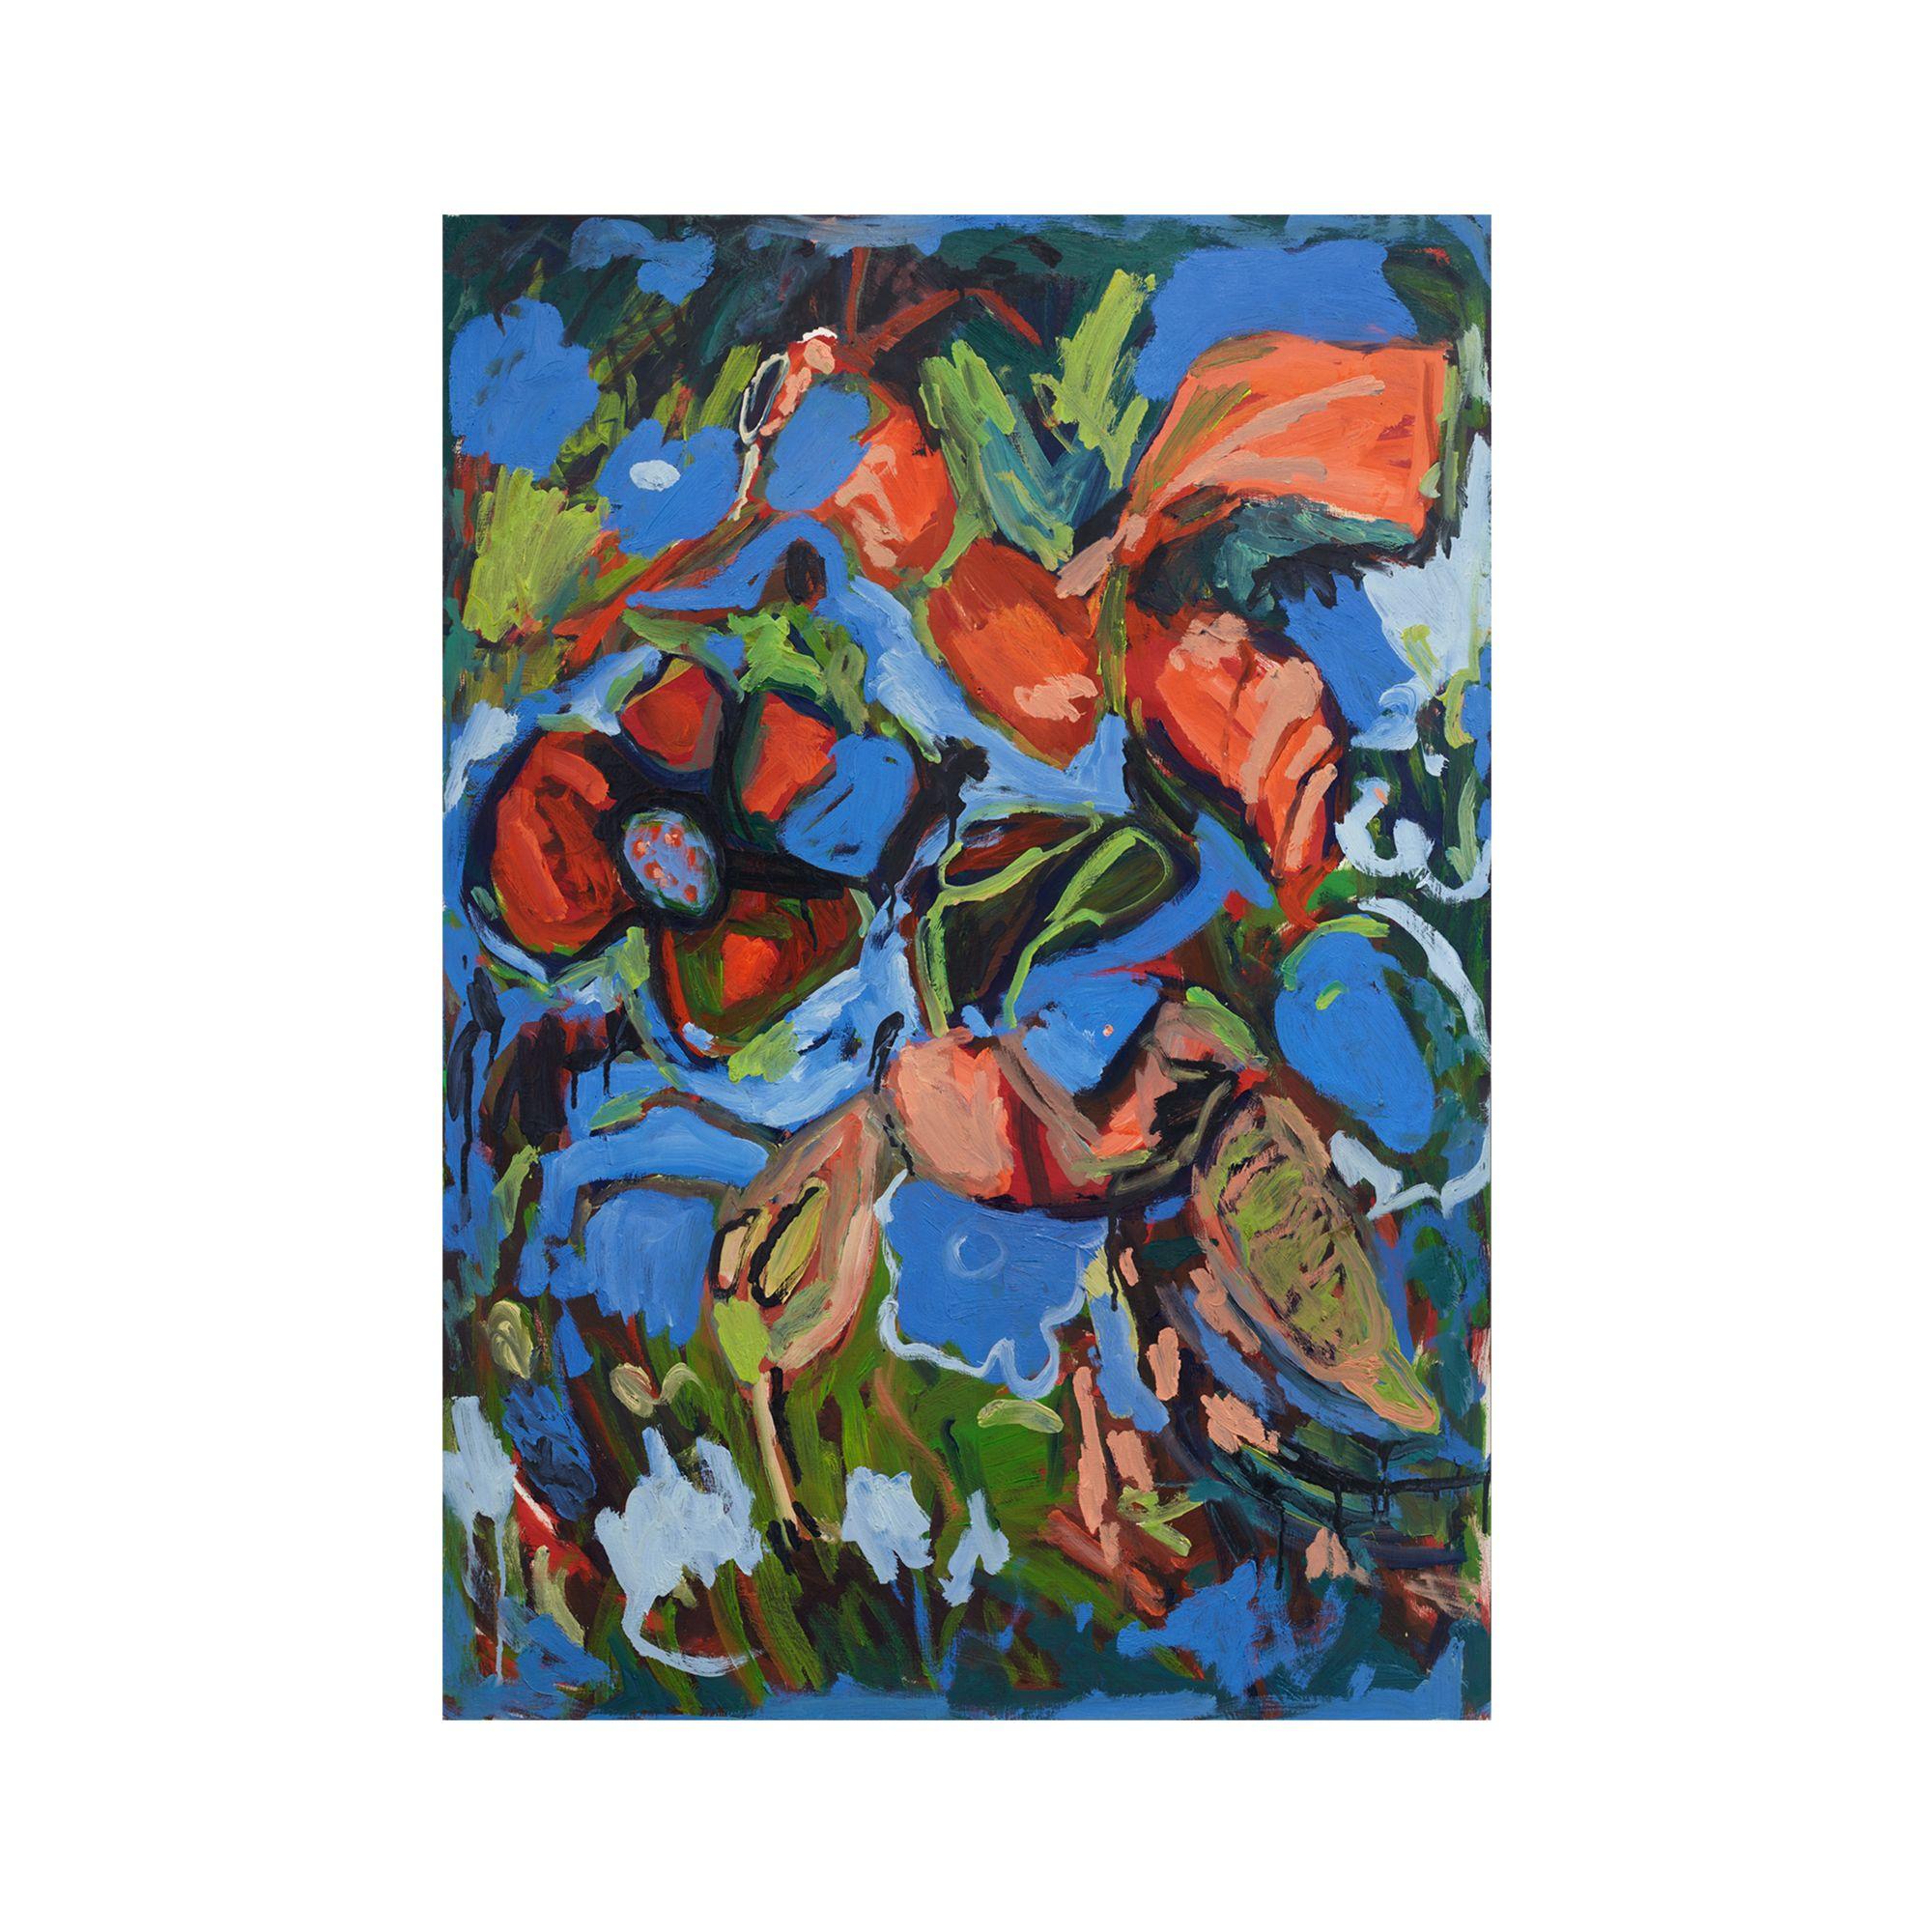 "Adrianne Rubenstein, Honeybees in Corn Flowers   DIMENSIONS 28"" x 19.5"" MEDIUM archival pigment print"